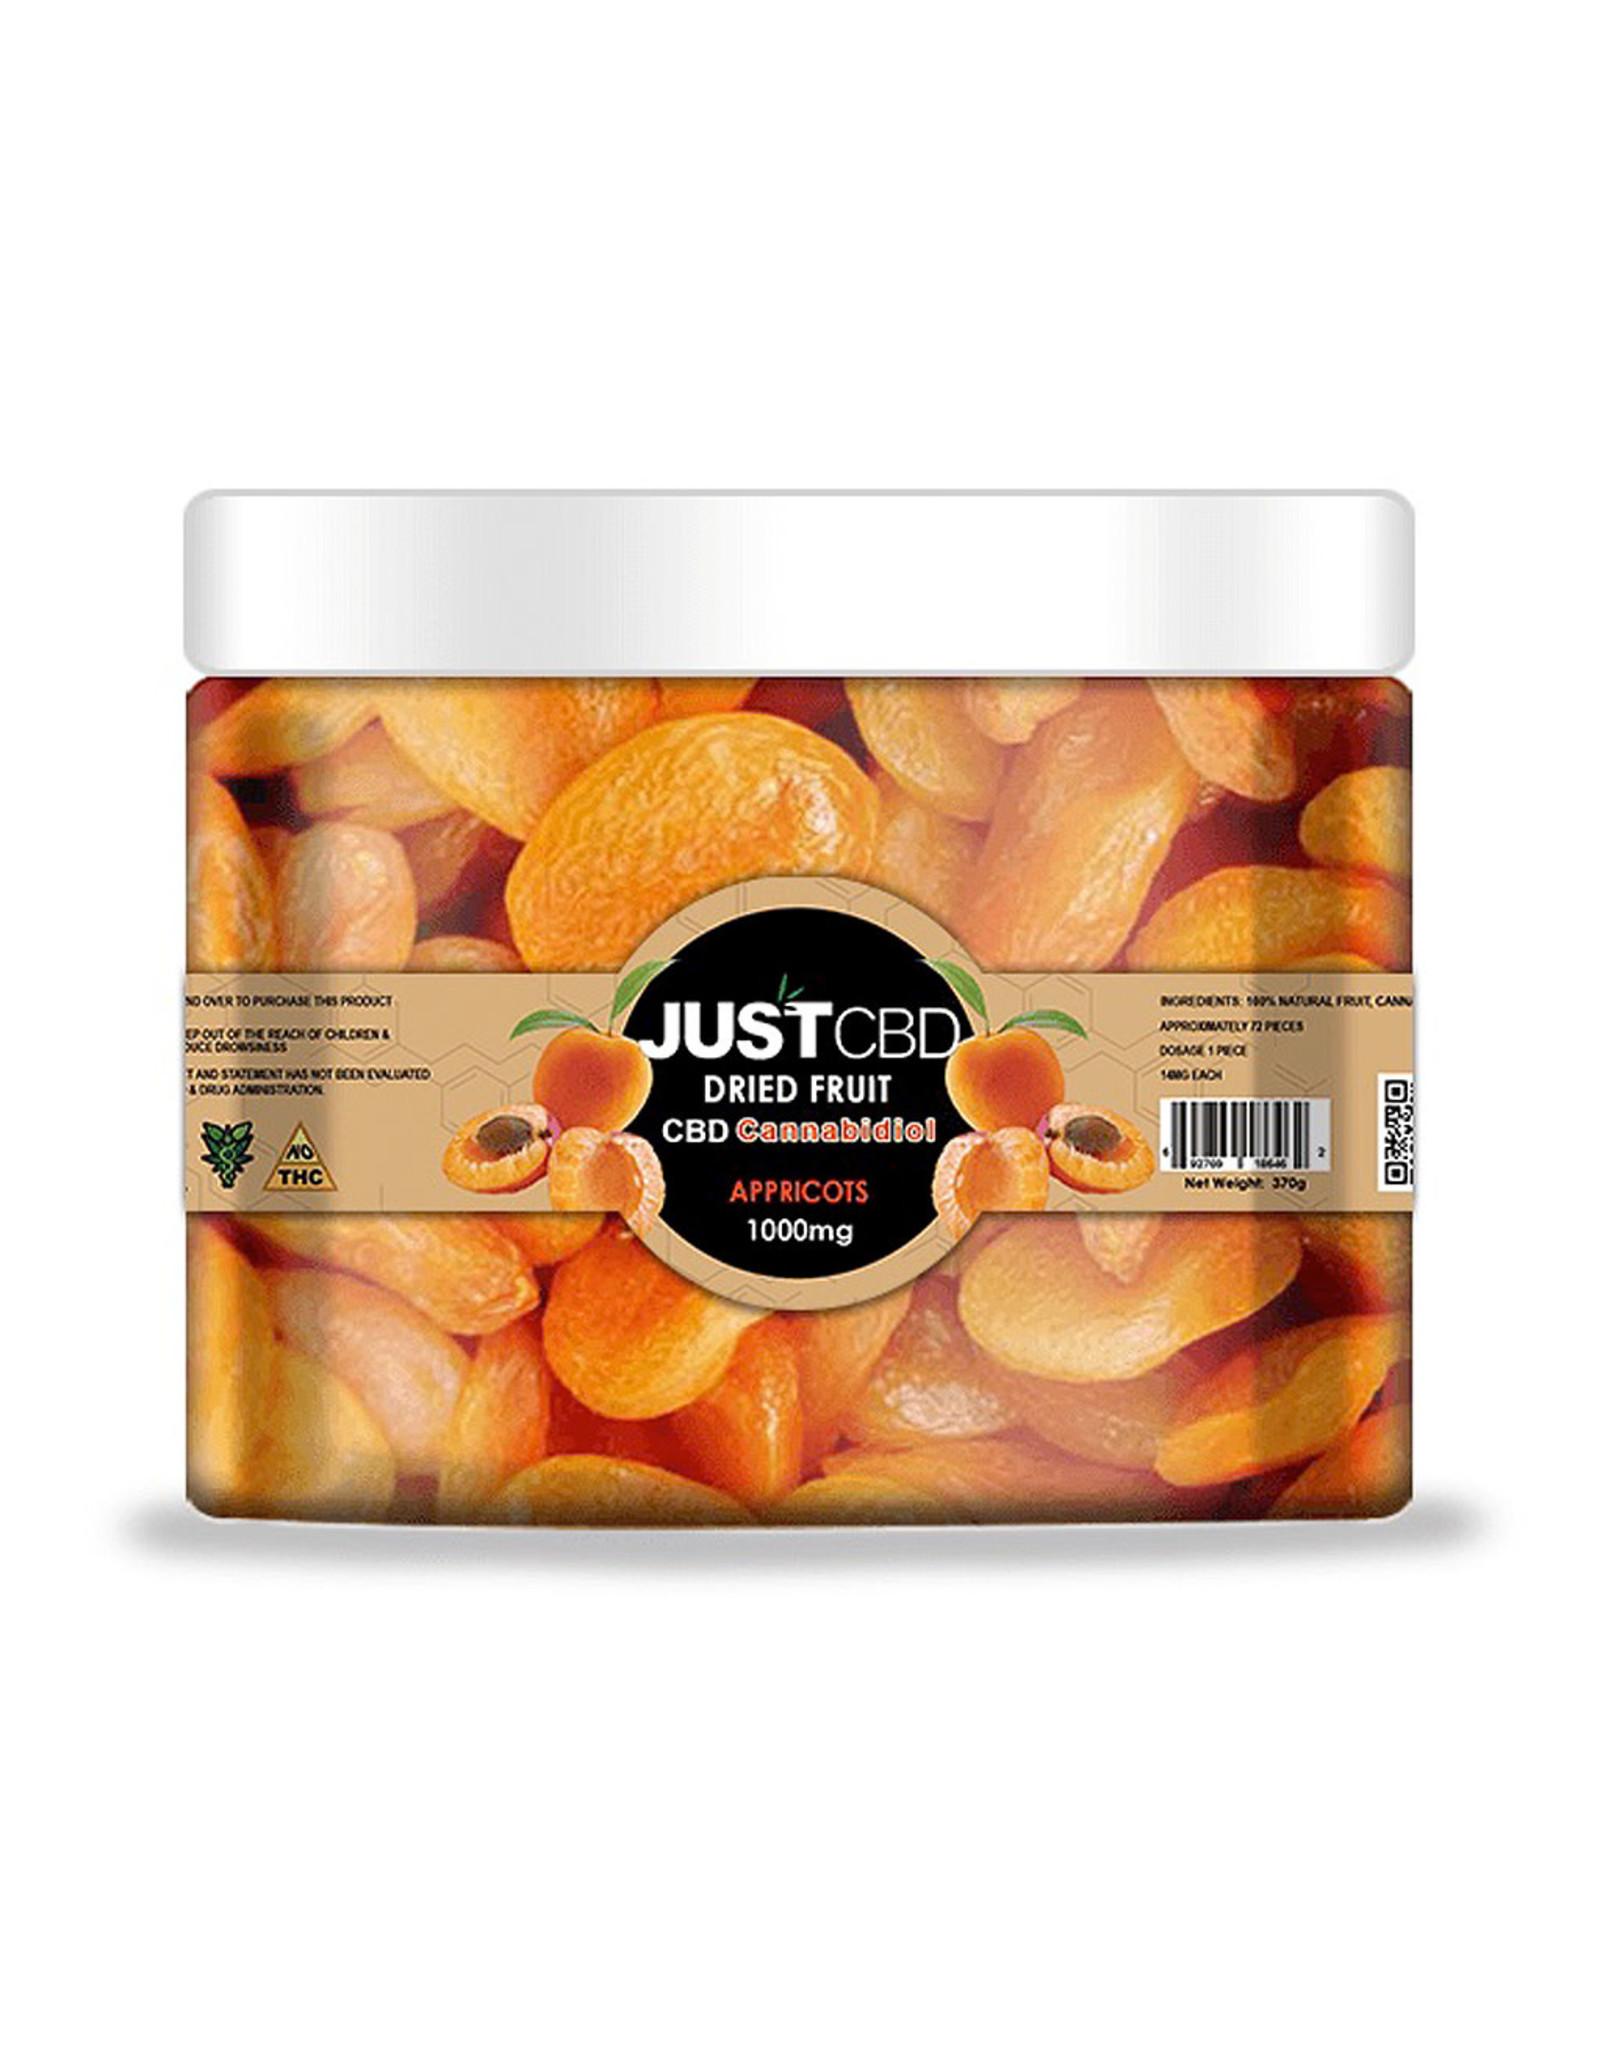 JustCBD JustCBD 1000mg Dried Fruit